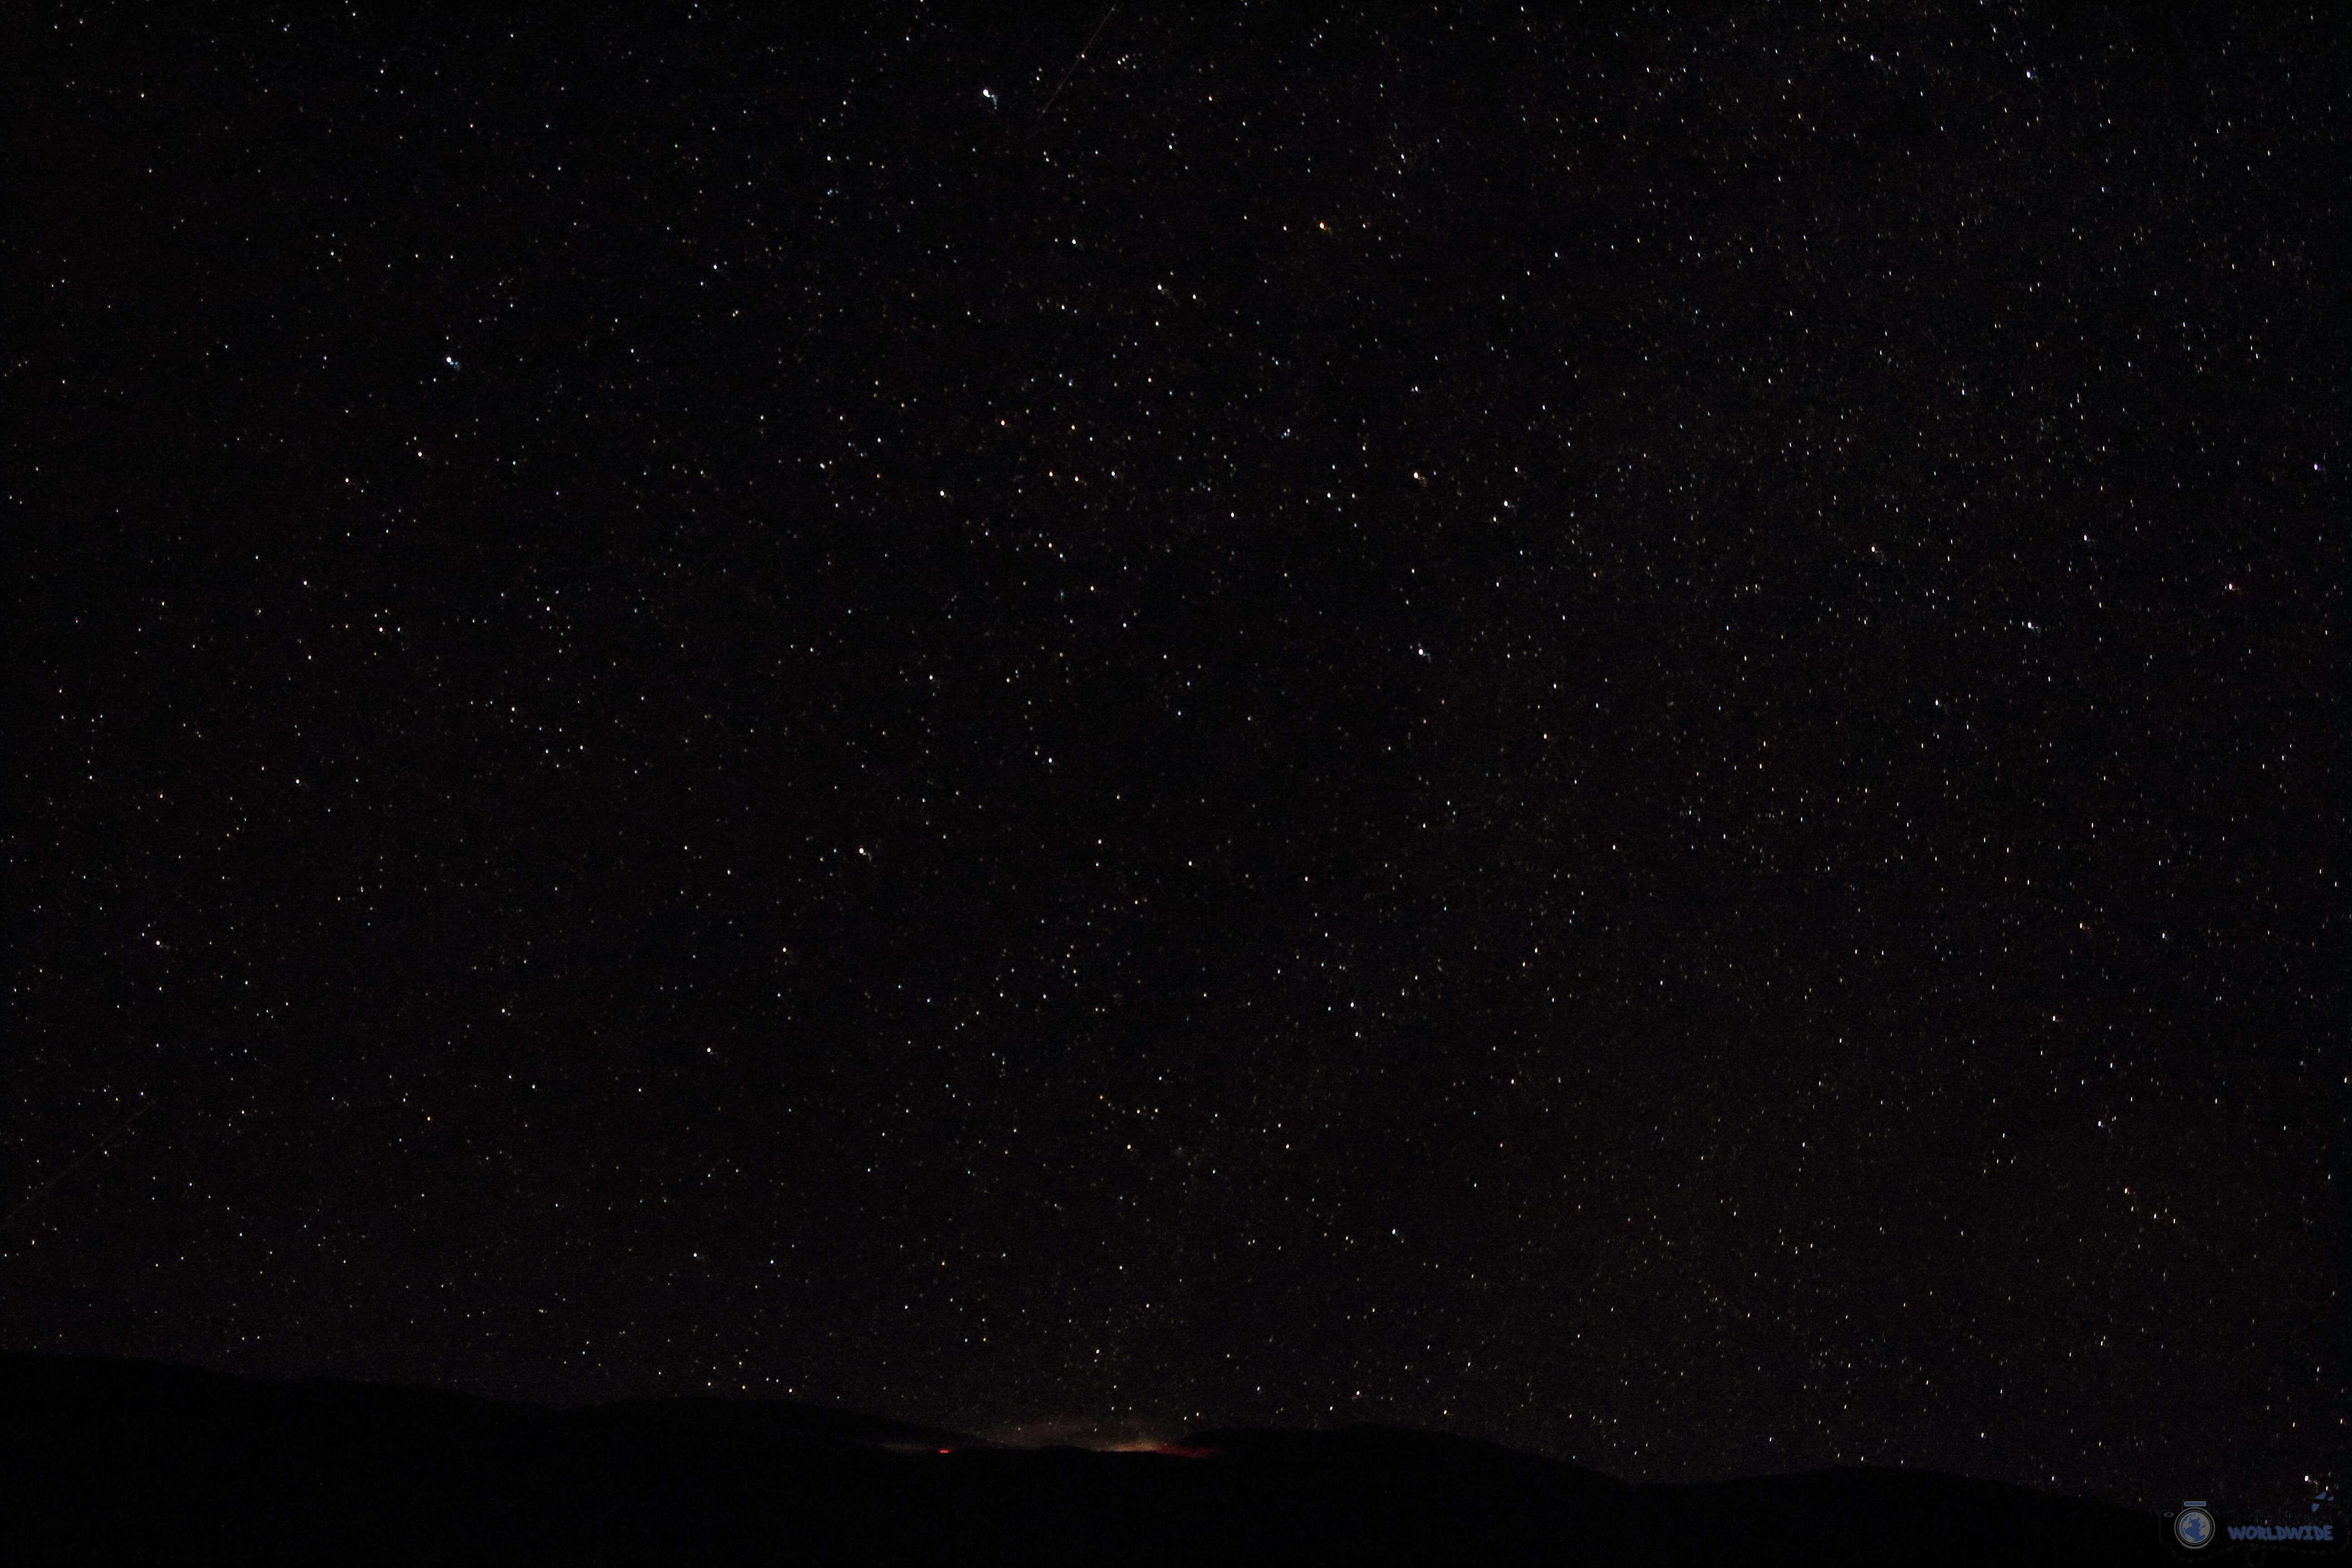 Stars at Mauna Kea Visitor's Center, Island of Hawaii, Hawaii